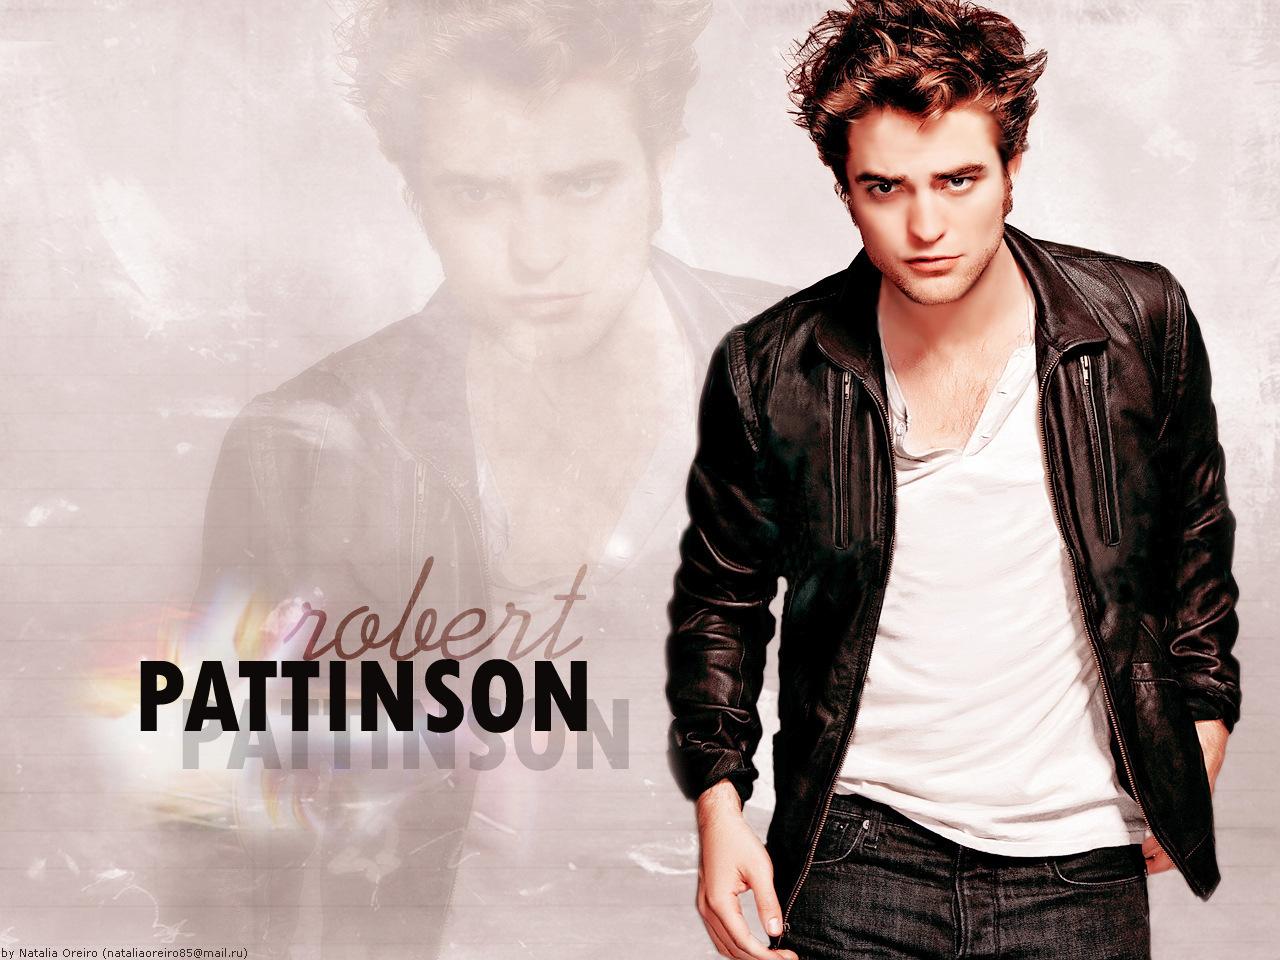 ROBERT PATTINSON - Pagina 3 Rob-Pattinson-so-Hot-robert-pattinson-9215590-1280-960